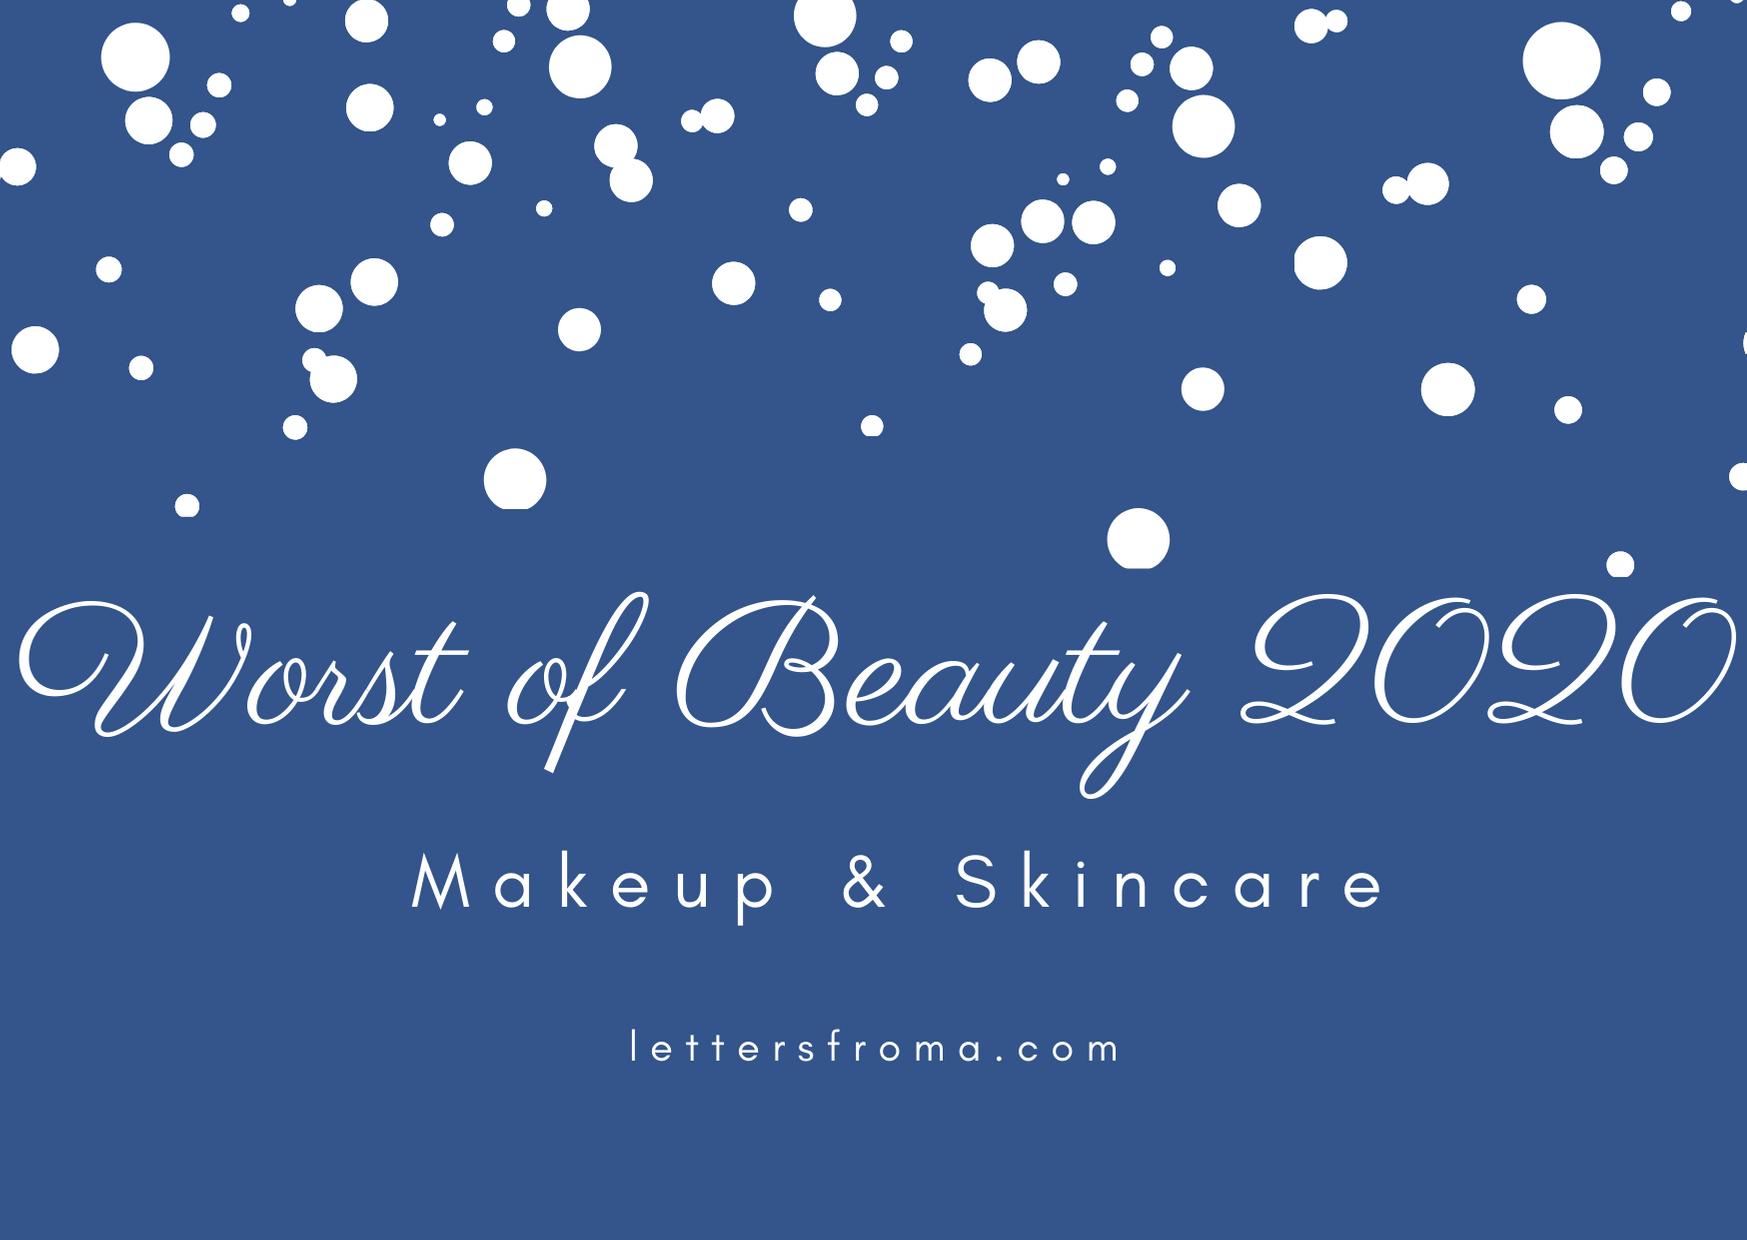 Worst of Beauty 2020